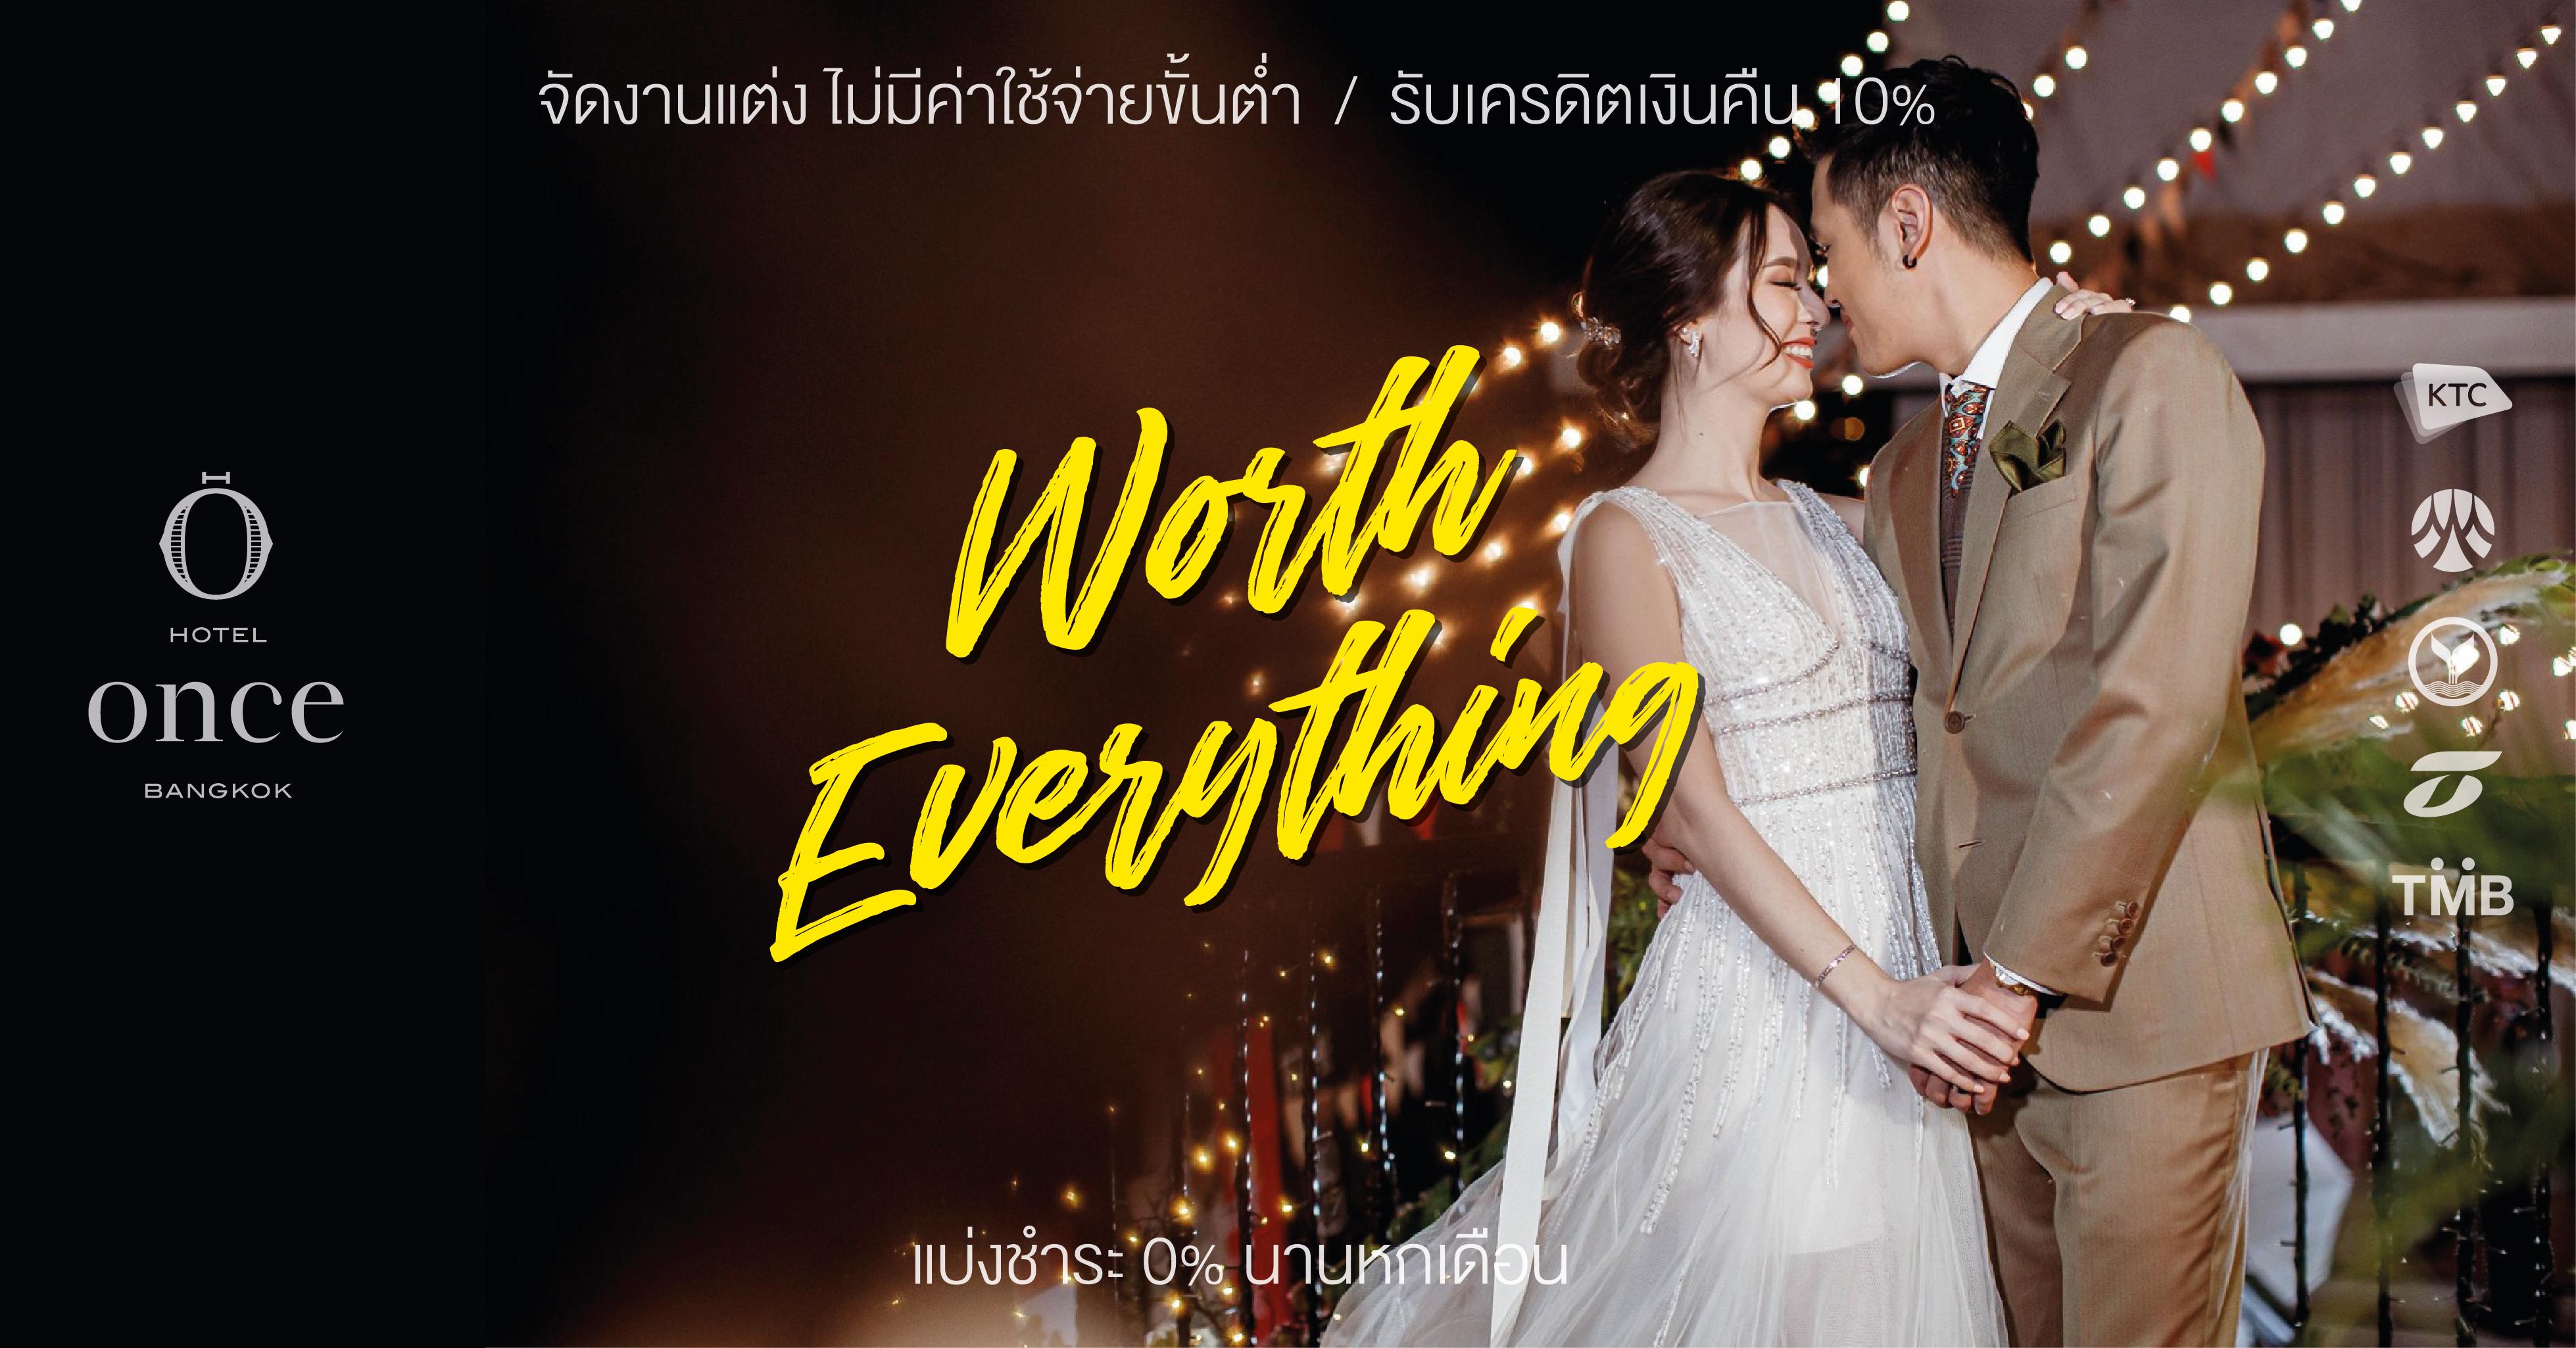 undefined พบกับโปรโมชั่นงานแต่งสุดคุ้ม ในปี 2020 นี้! จาก Hotel Once Bangkok